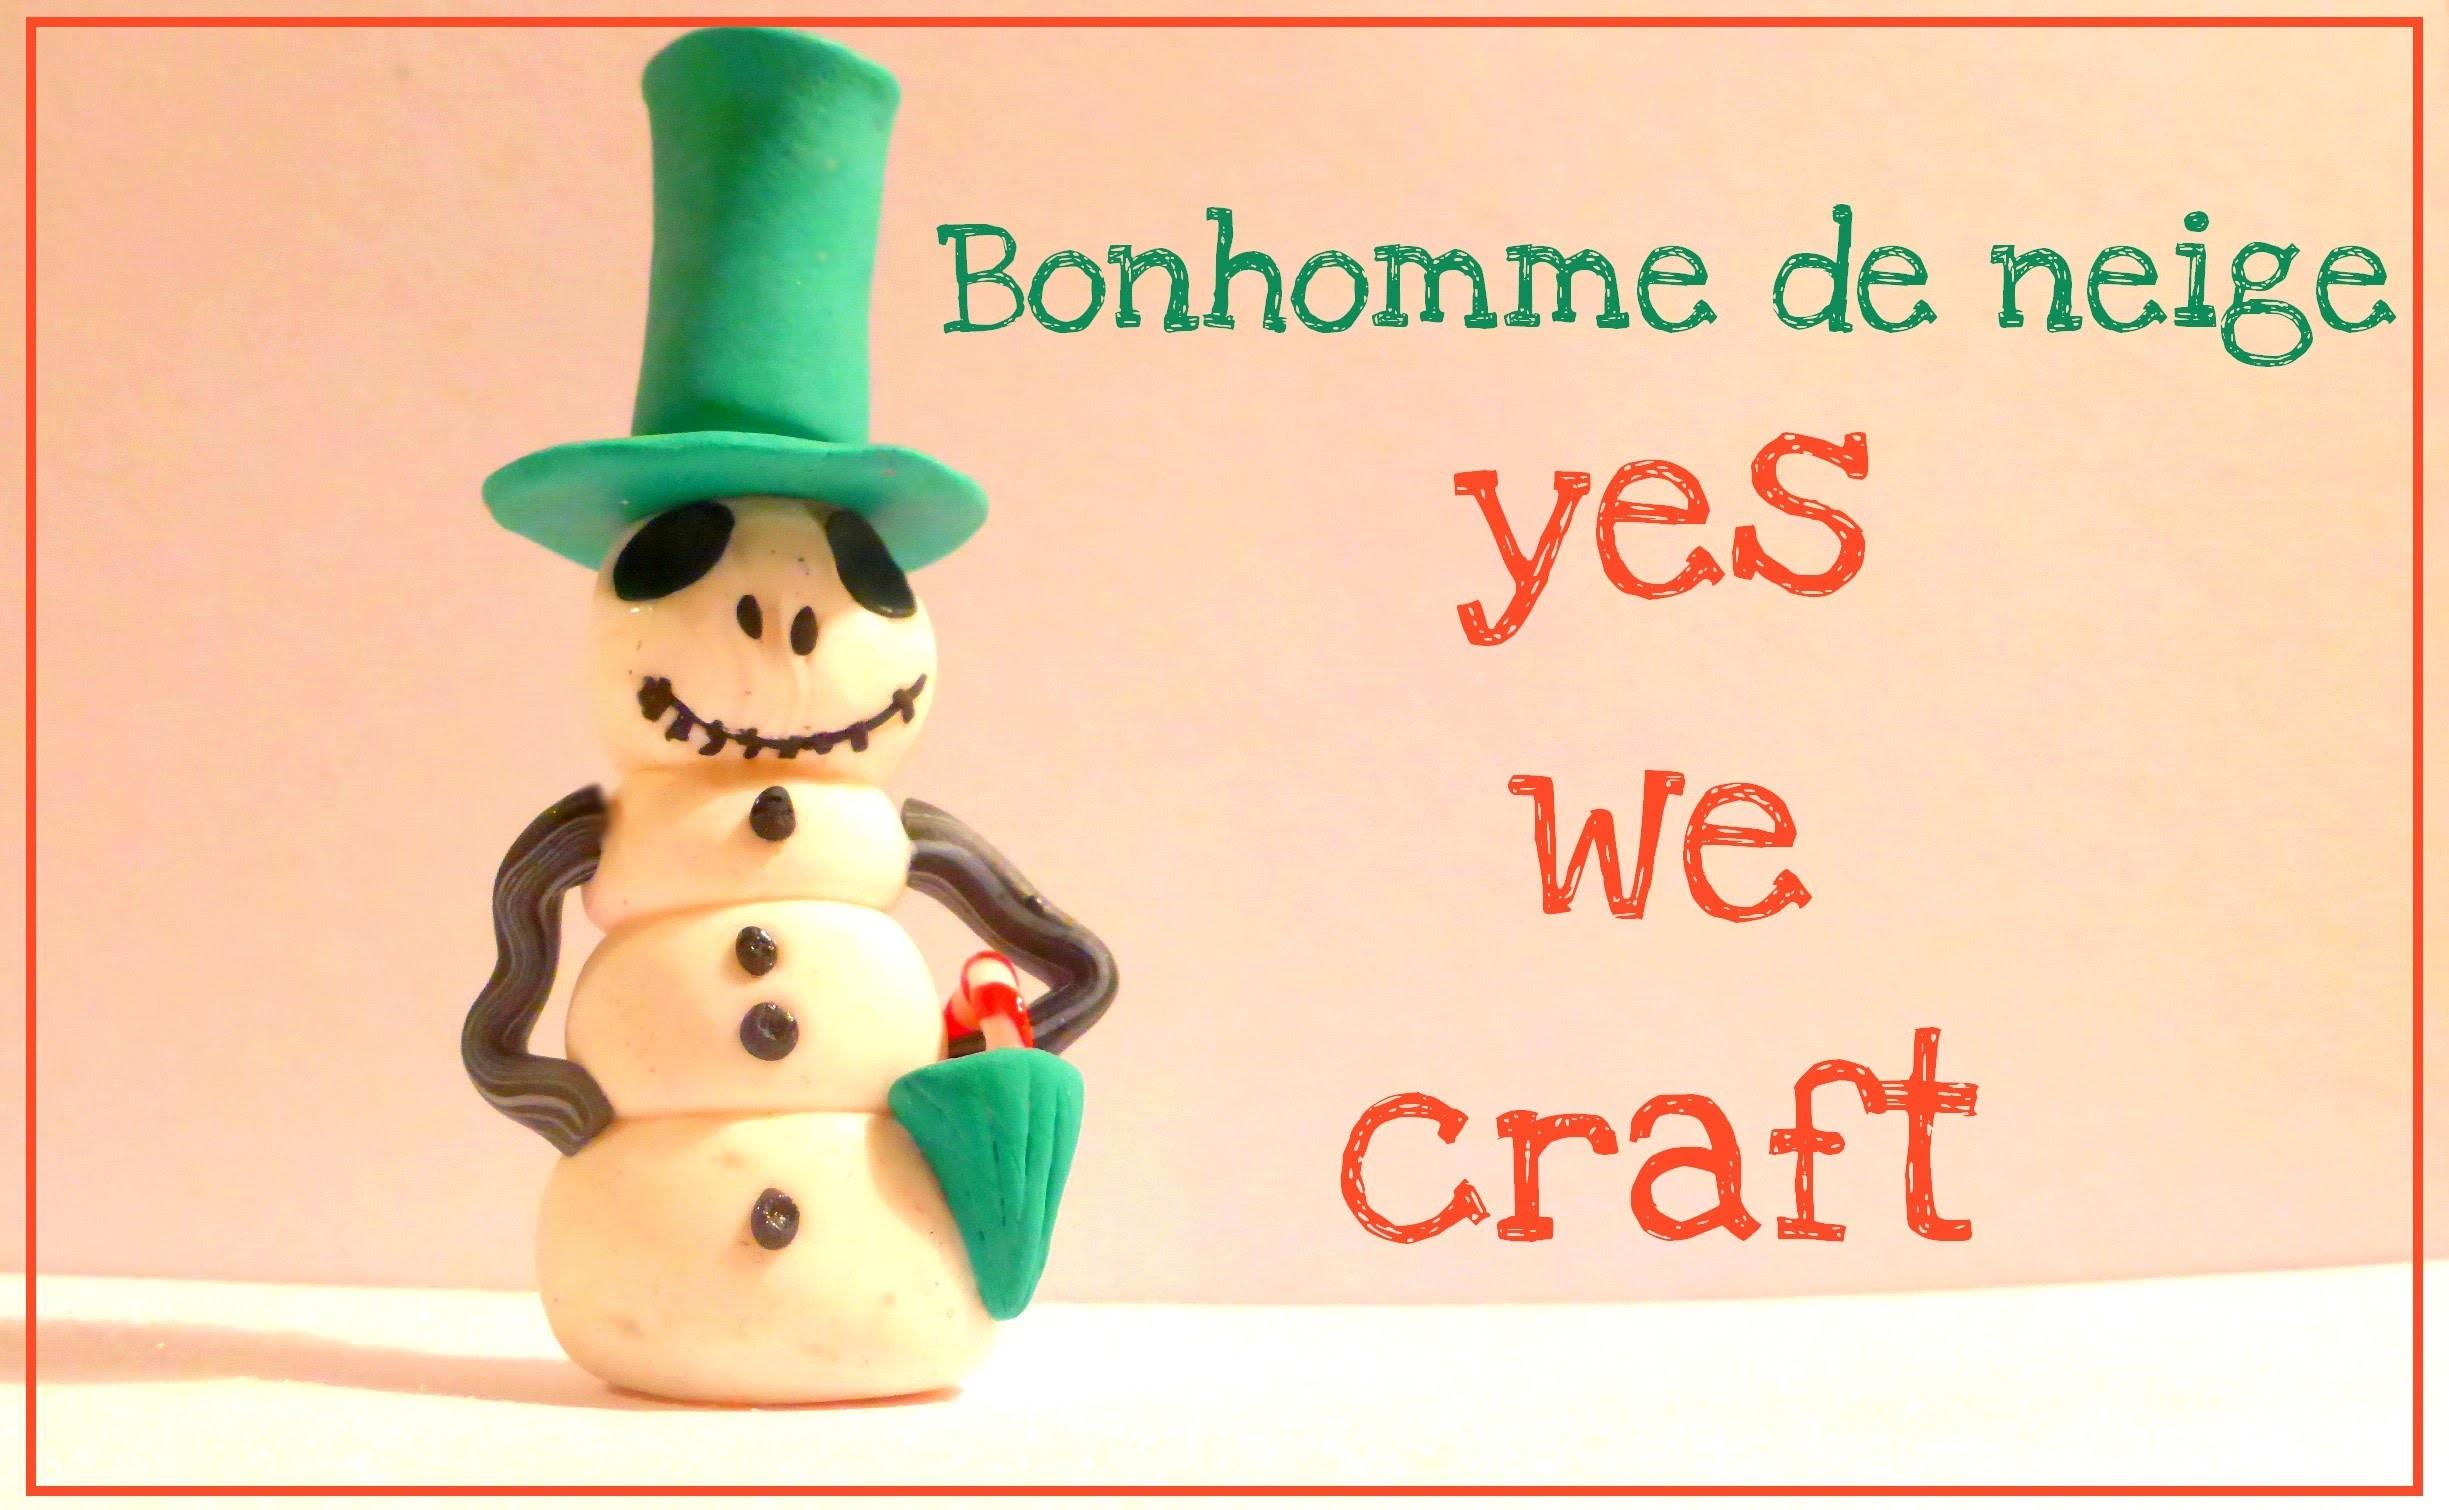 [Yes We Craft ll Xmas edition] 3# Bonhomme de Neige. Jack Skellington Snowman